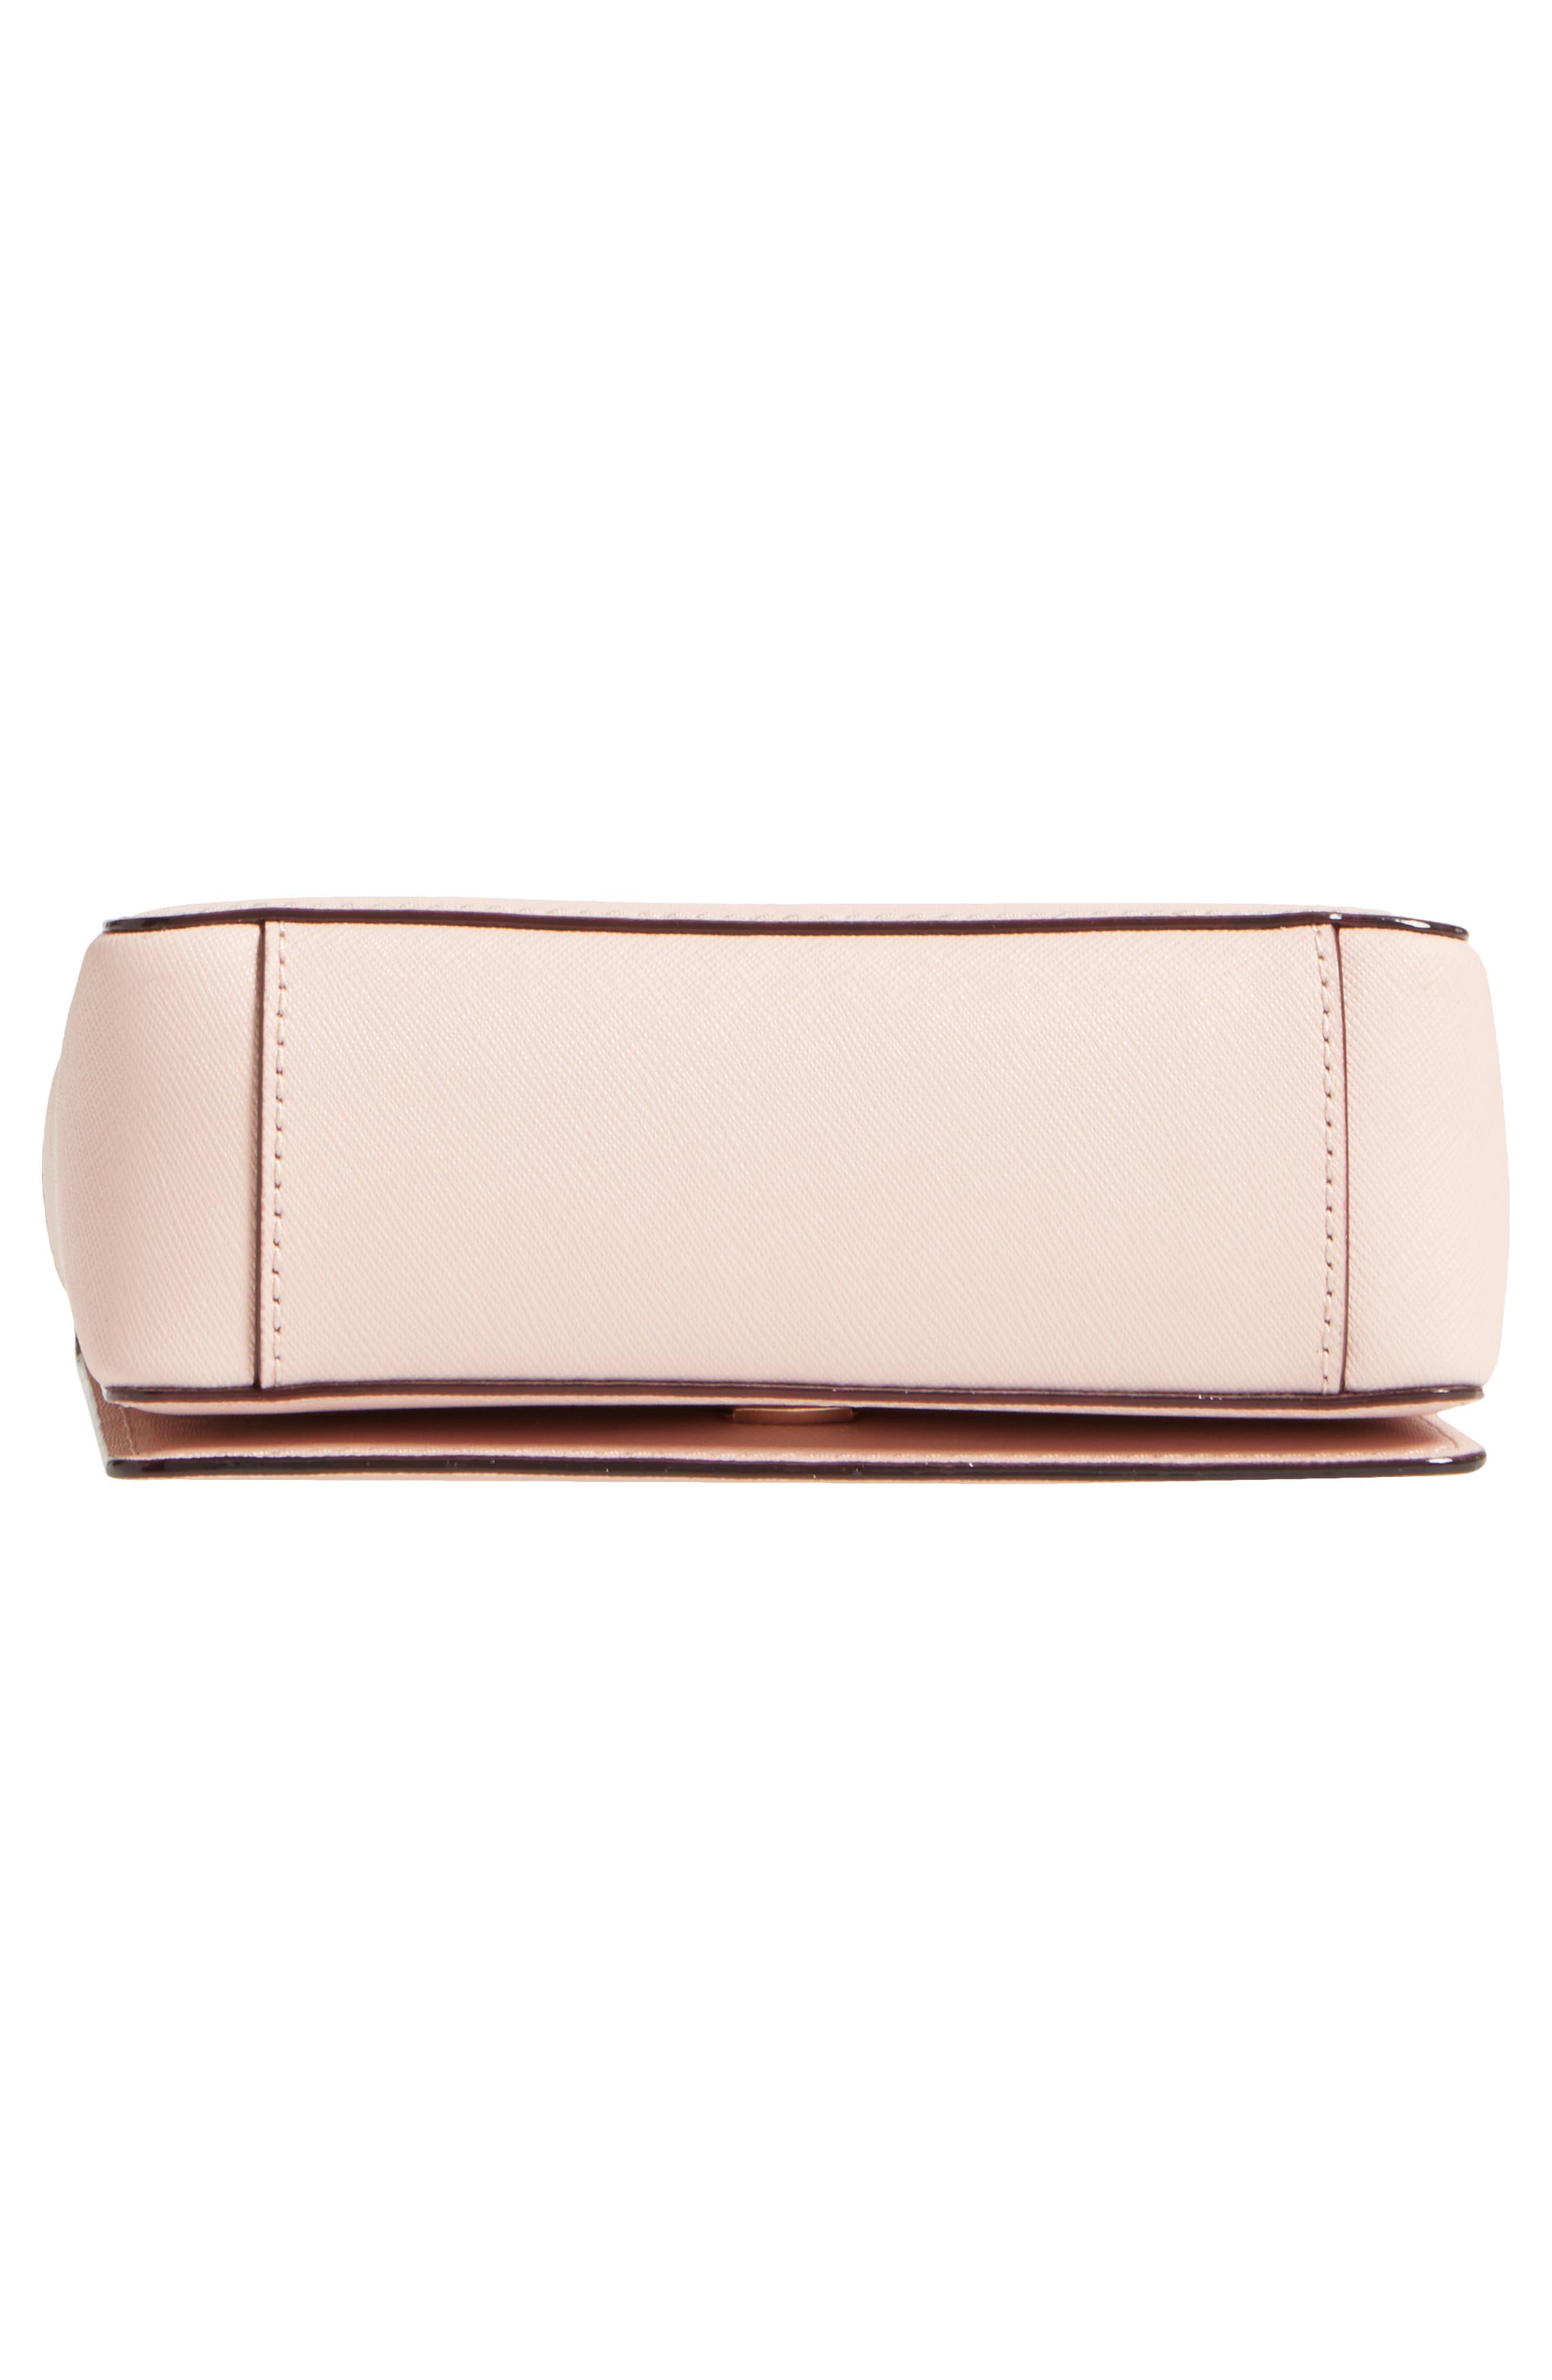 cameron street - hope saffiano leather crossbody bag,                             Alternate thumbnail 18, color,